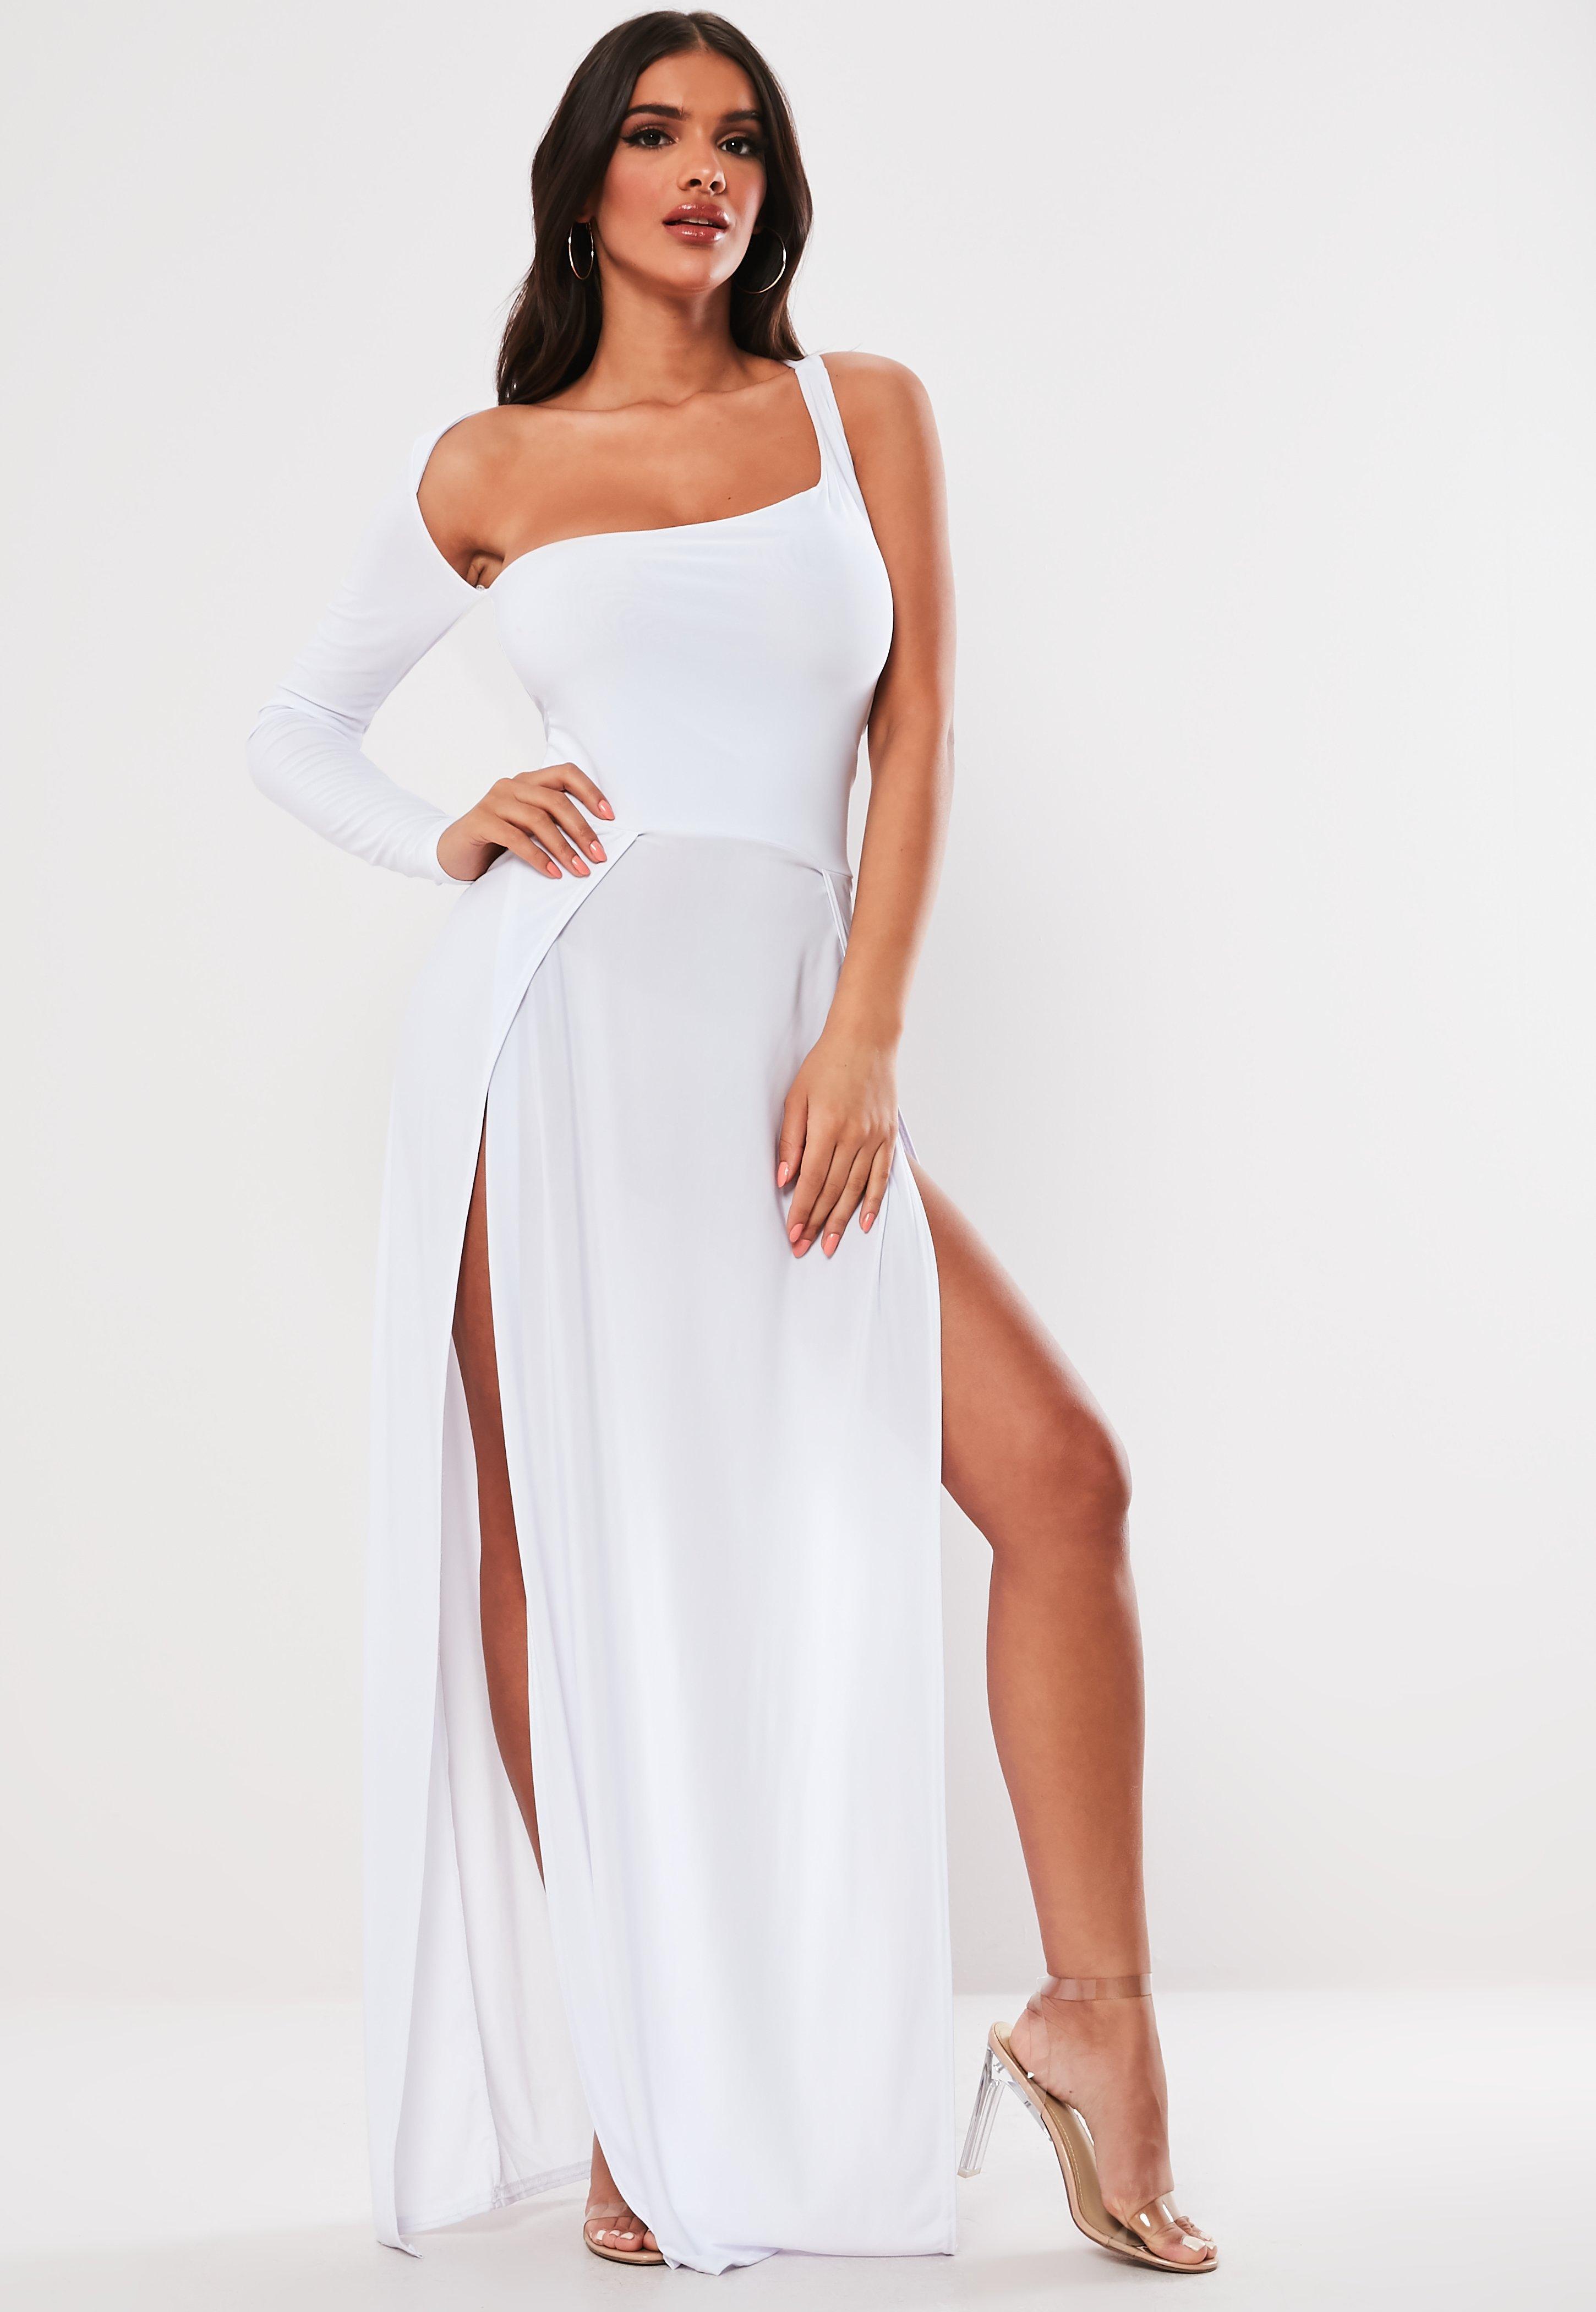 c595011429 Missguided White Slinky One Shoulder Split Maxi Dress in White - Lyst